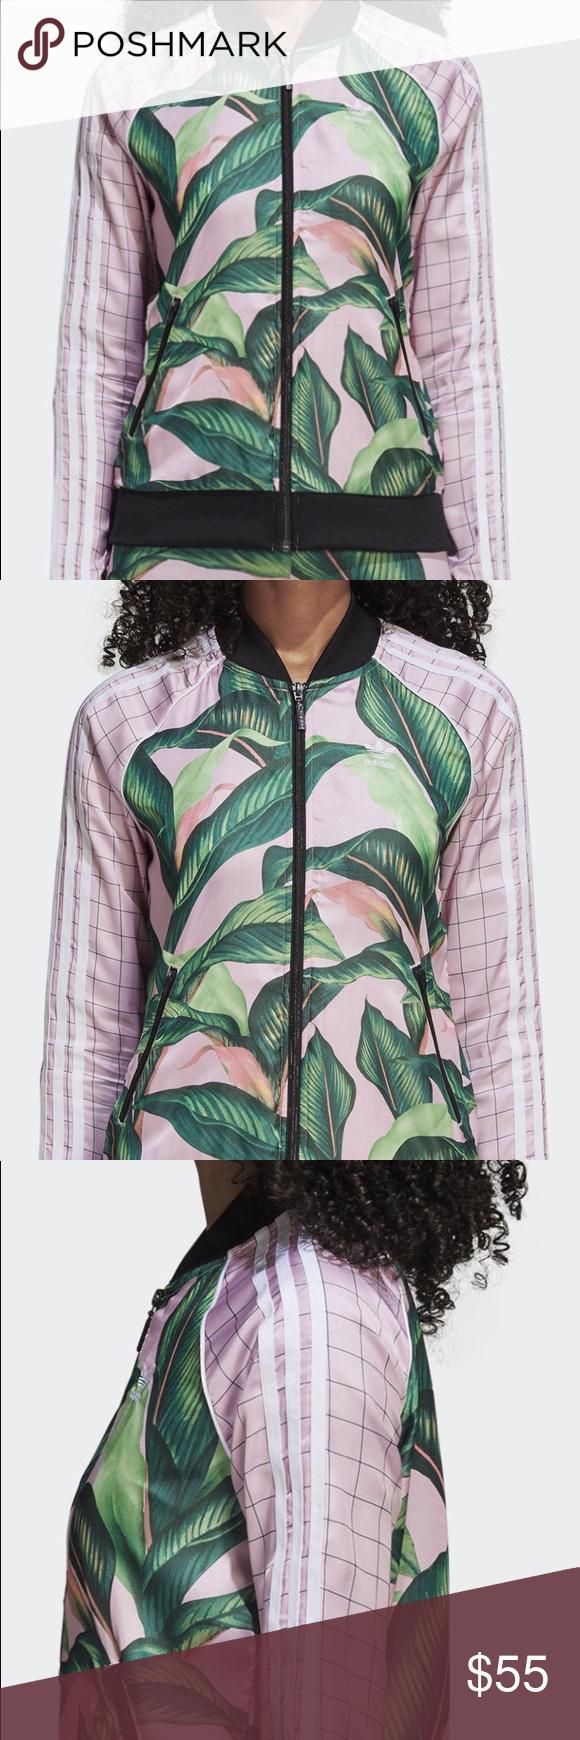 2ccc76822186a NWT Adidas originals sst track jacket medium pink Adidas sst track jacket  This season, The